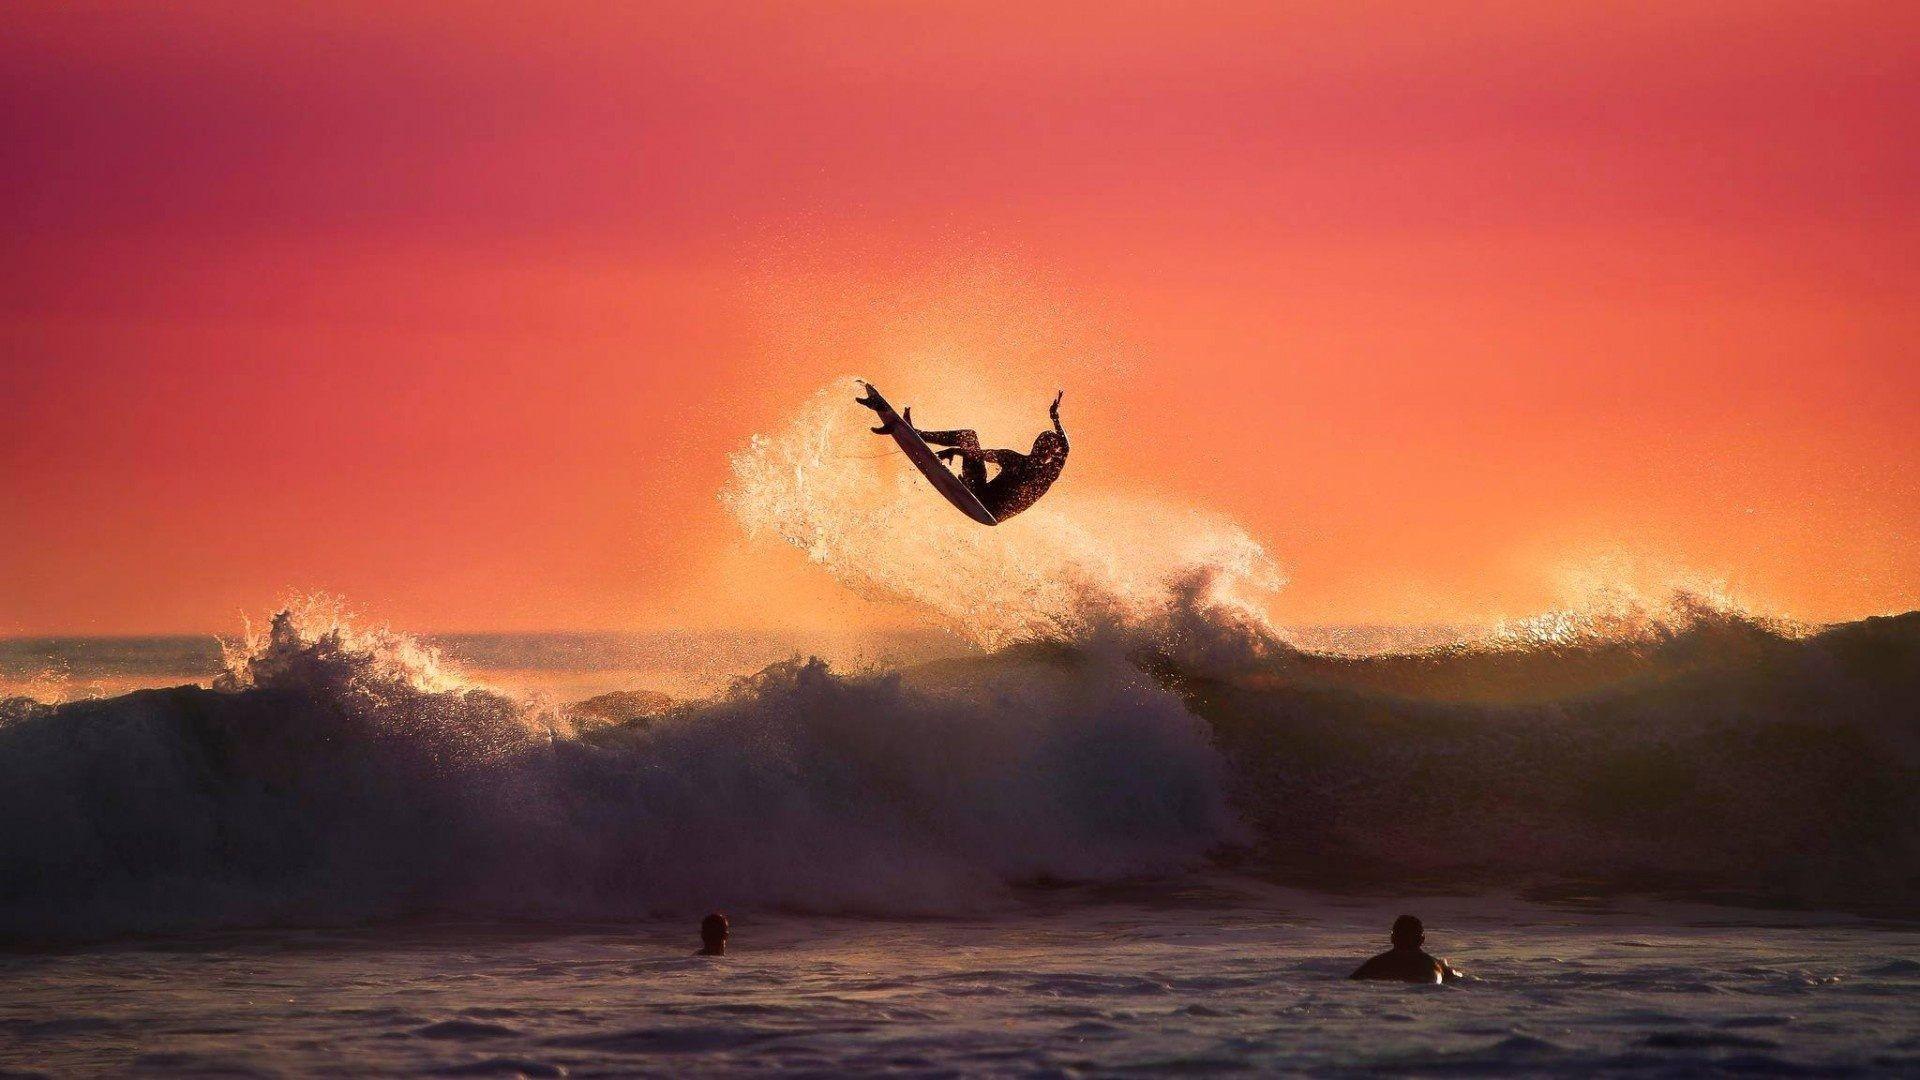 Surfer Girl Wallpaper HD Download Of Surfing Wallpaper